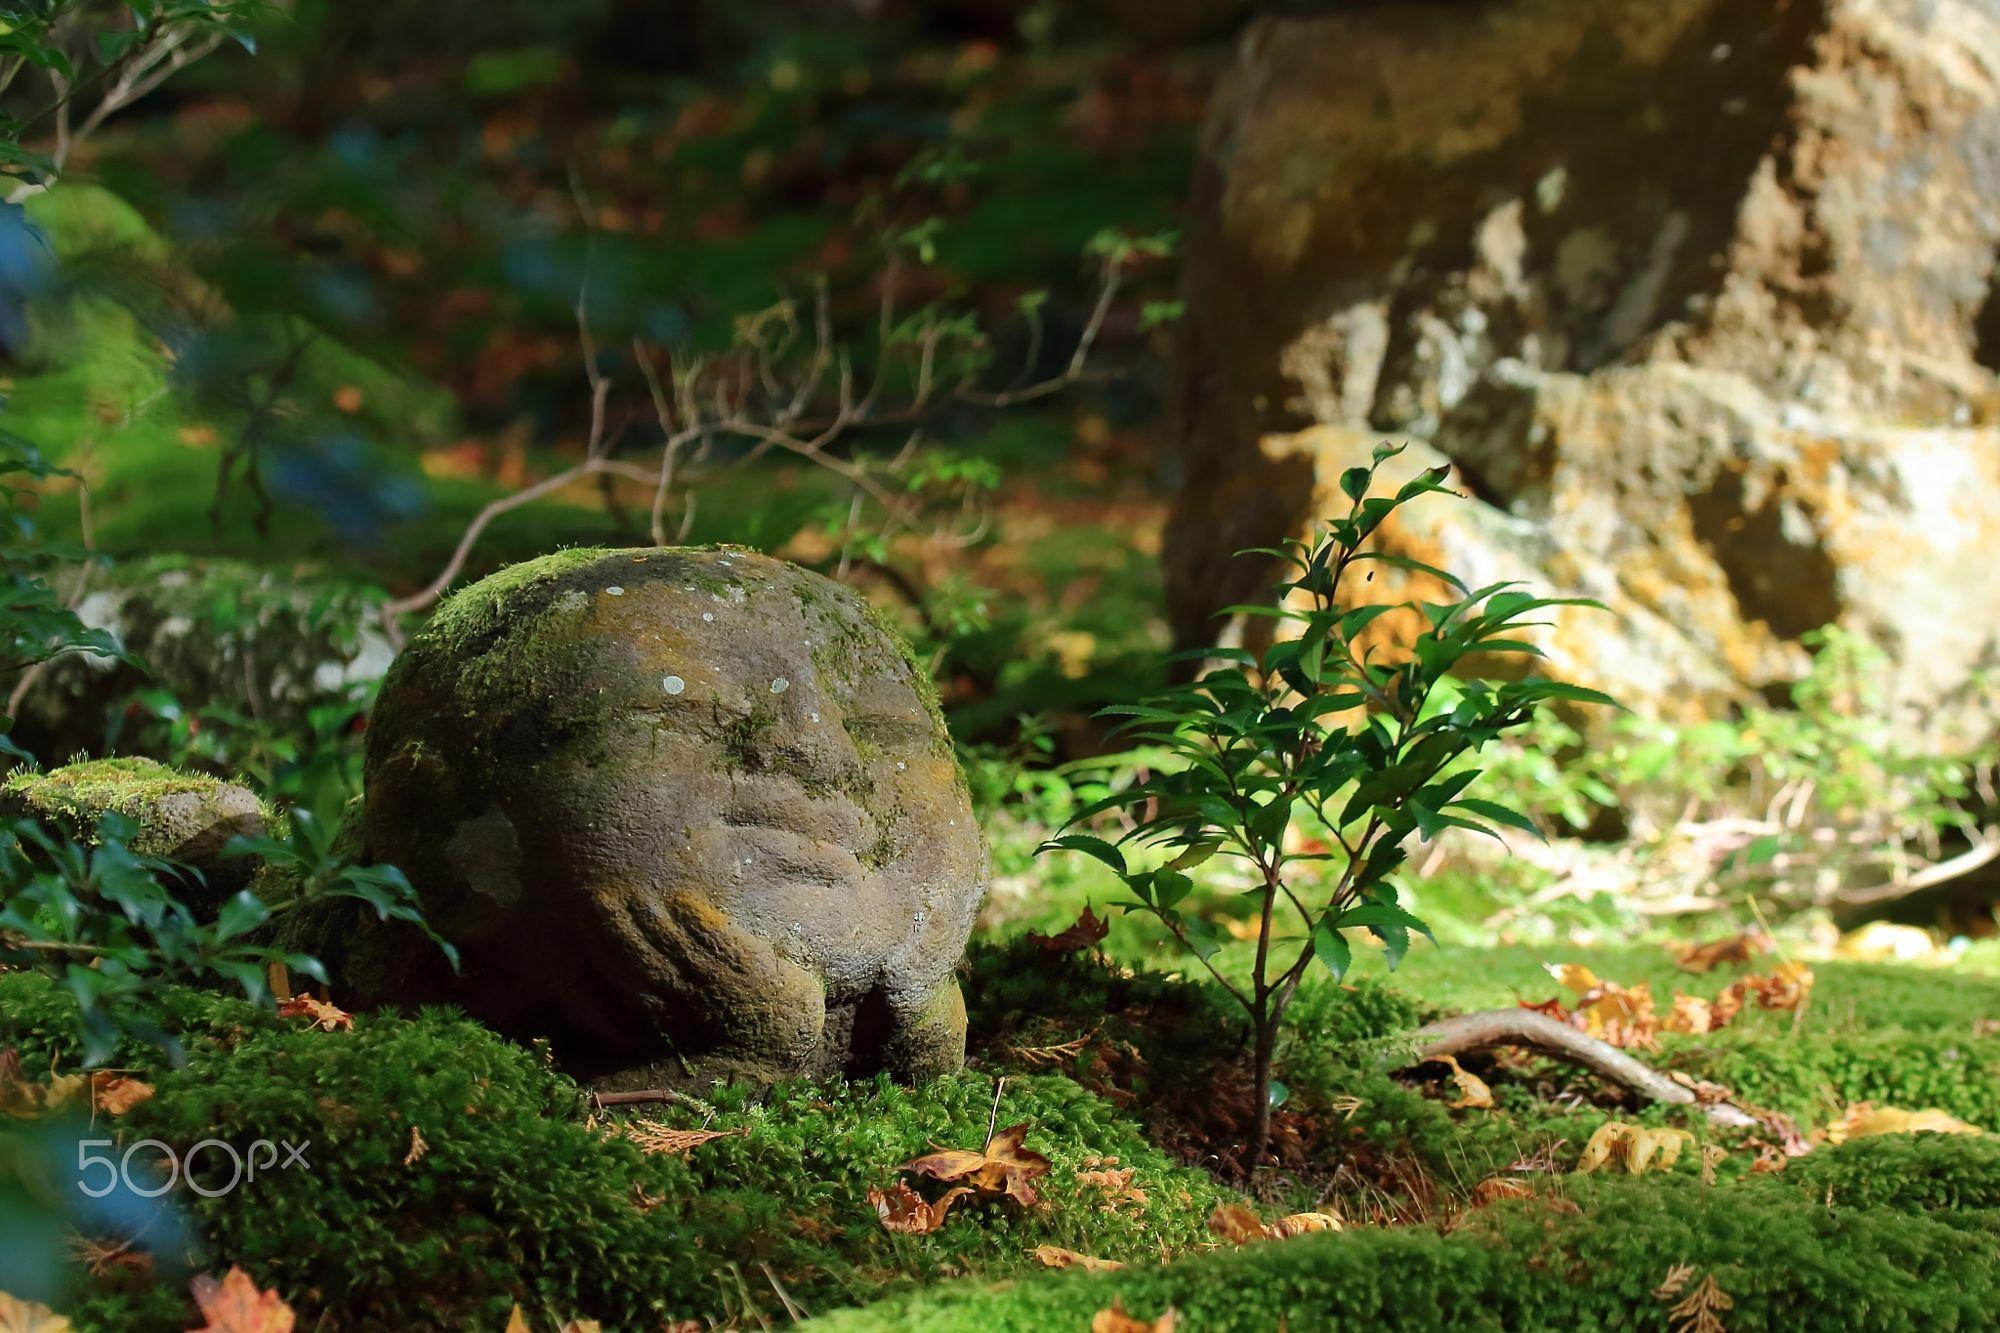 the Japanese stone Buddhas warabe jizou  Travel photo by Ganchan http://rarme.com/?F9gZi